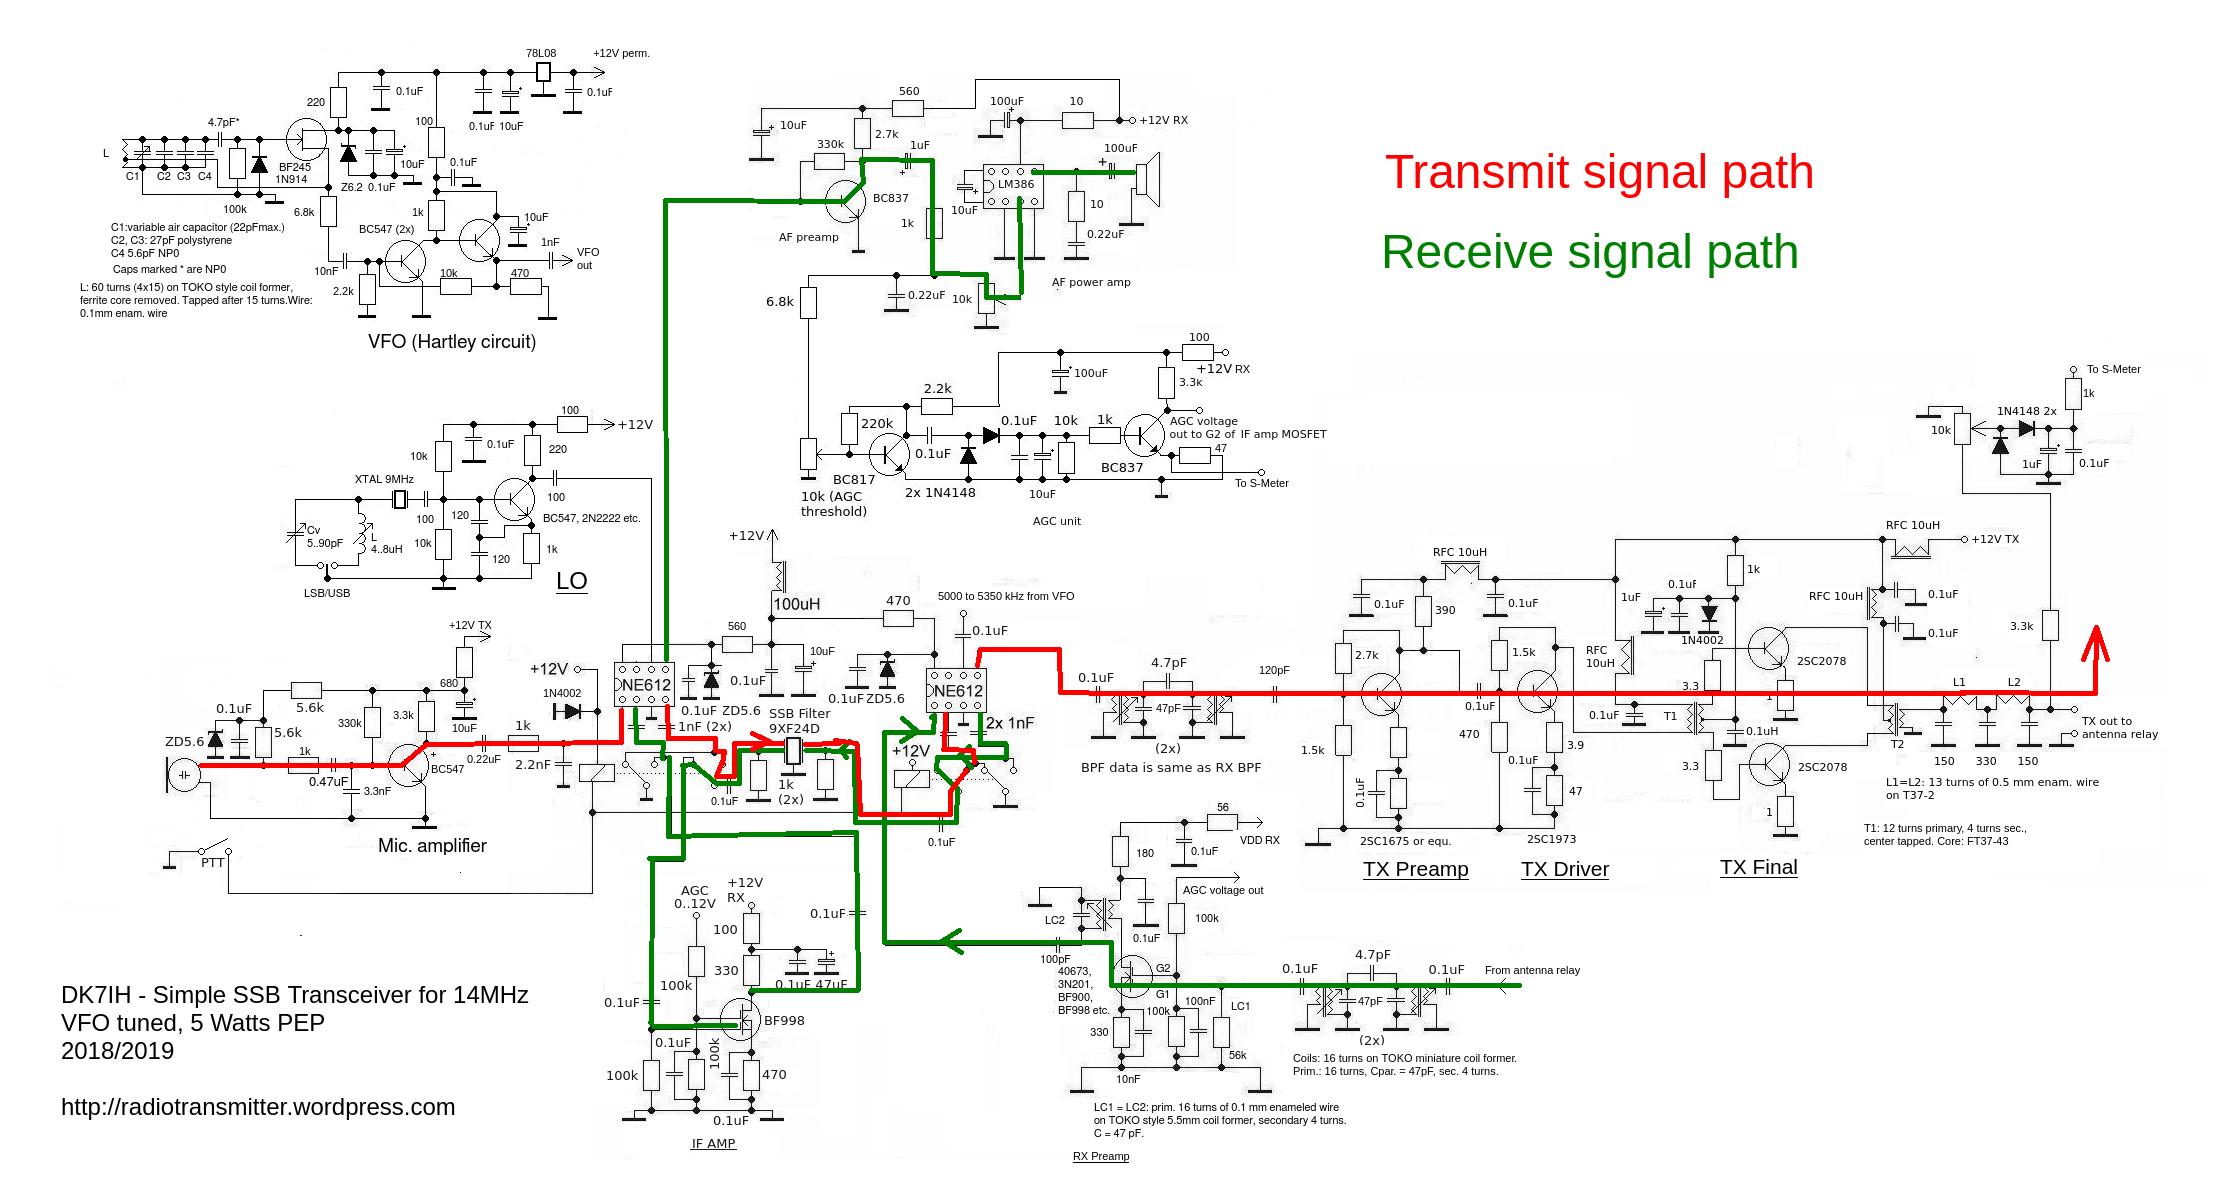 peter rachow amateur radio engineering projects peter rachow dk7ih fig 416 block diagram of ssb transmitter [ 2227 x 1185 Pixel ]